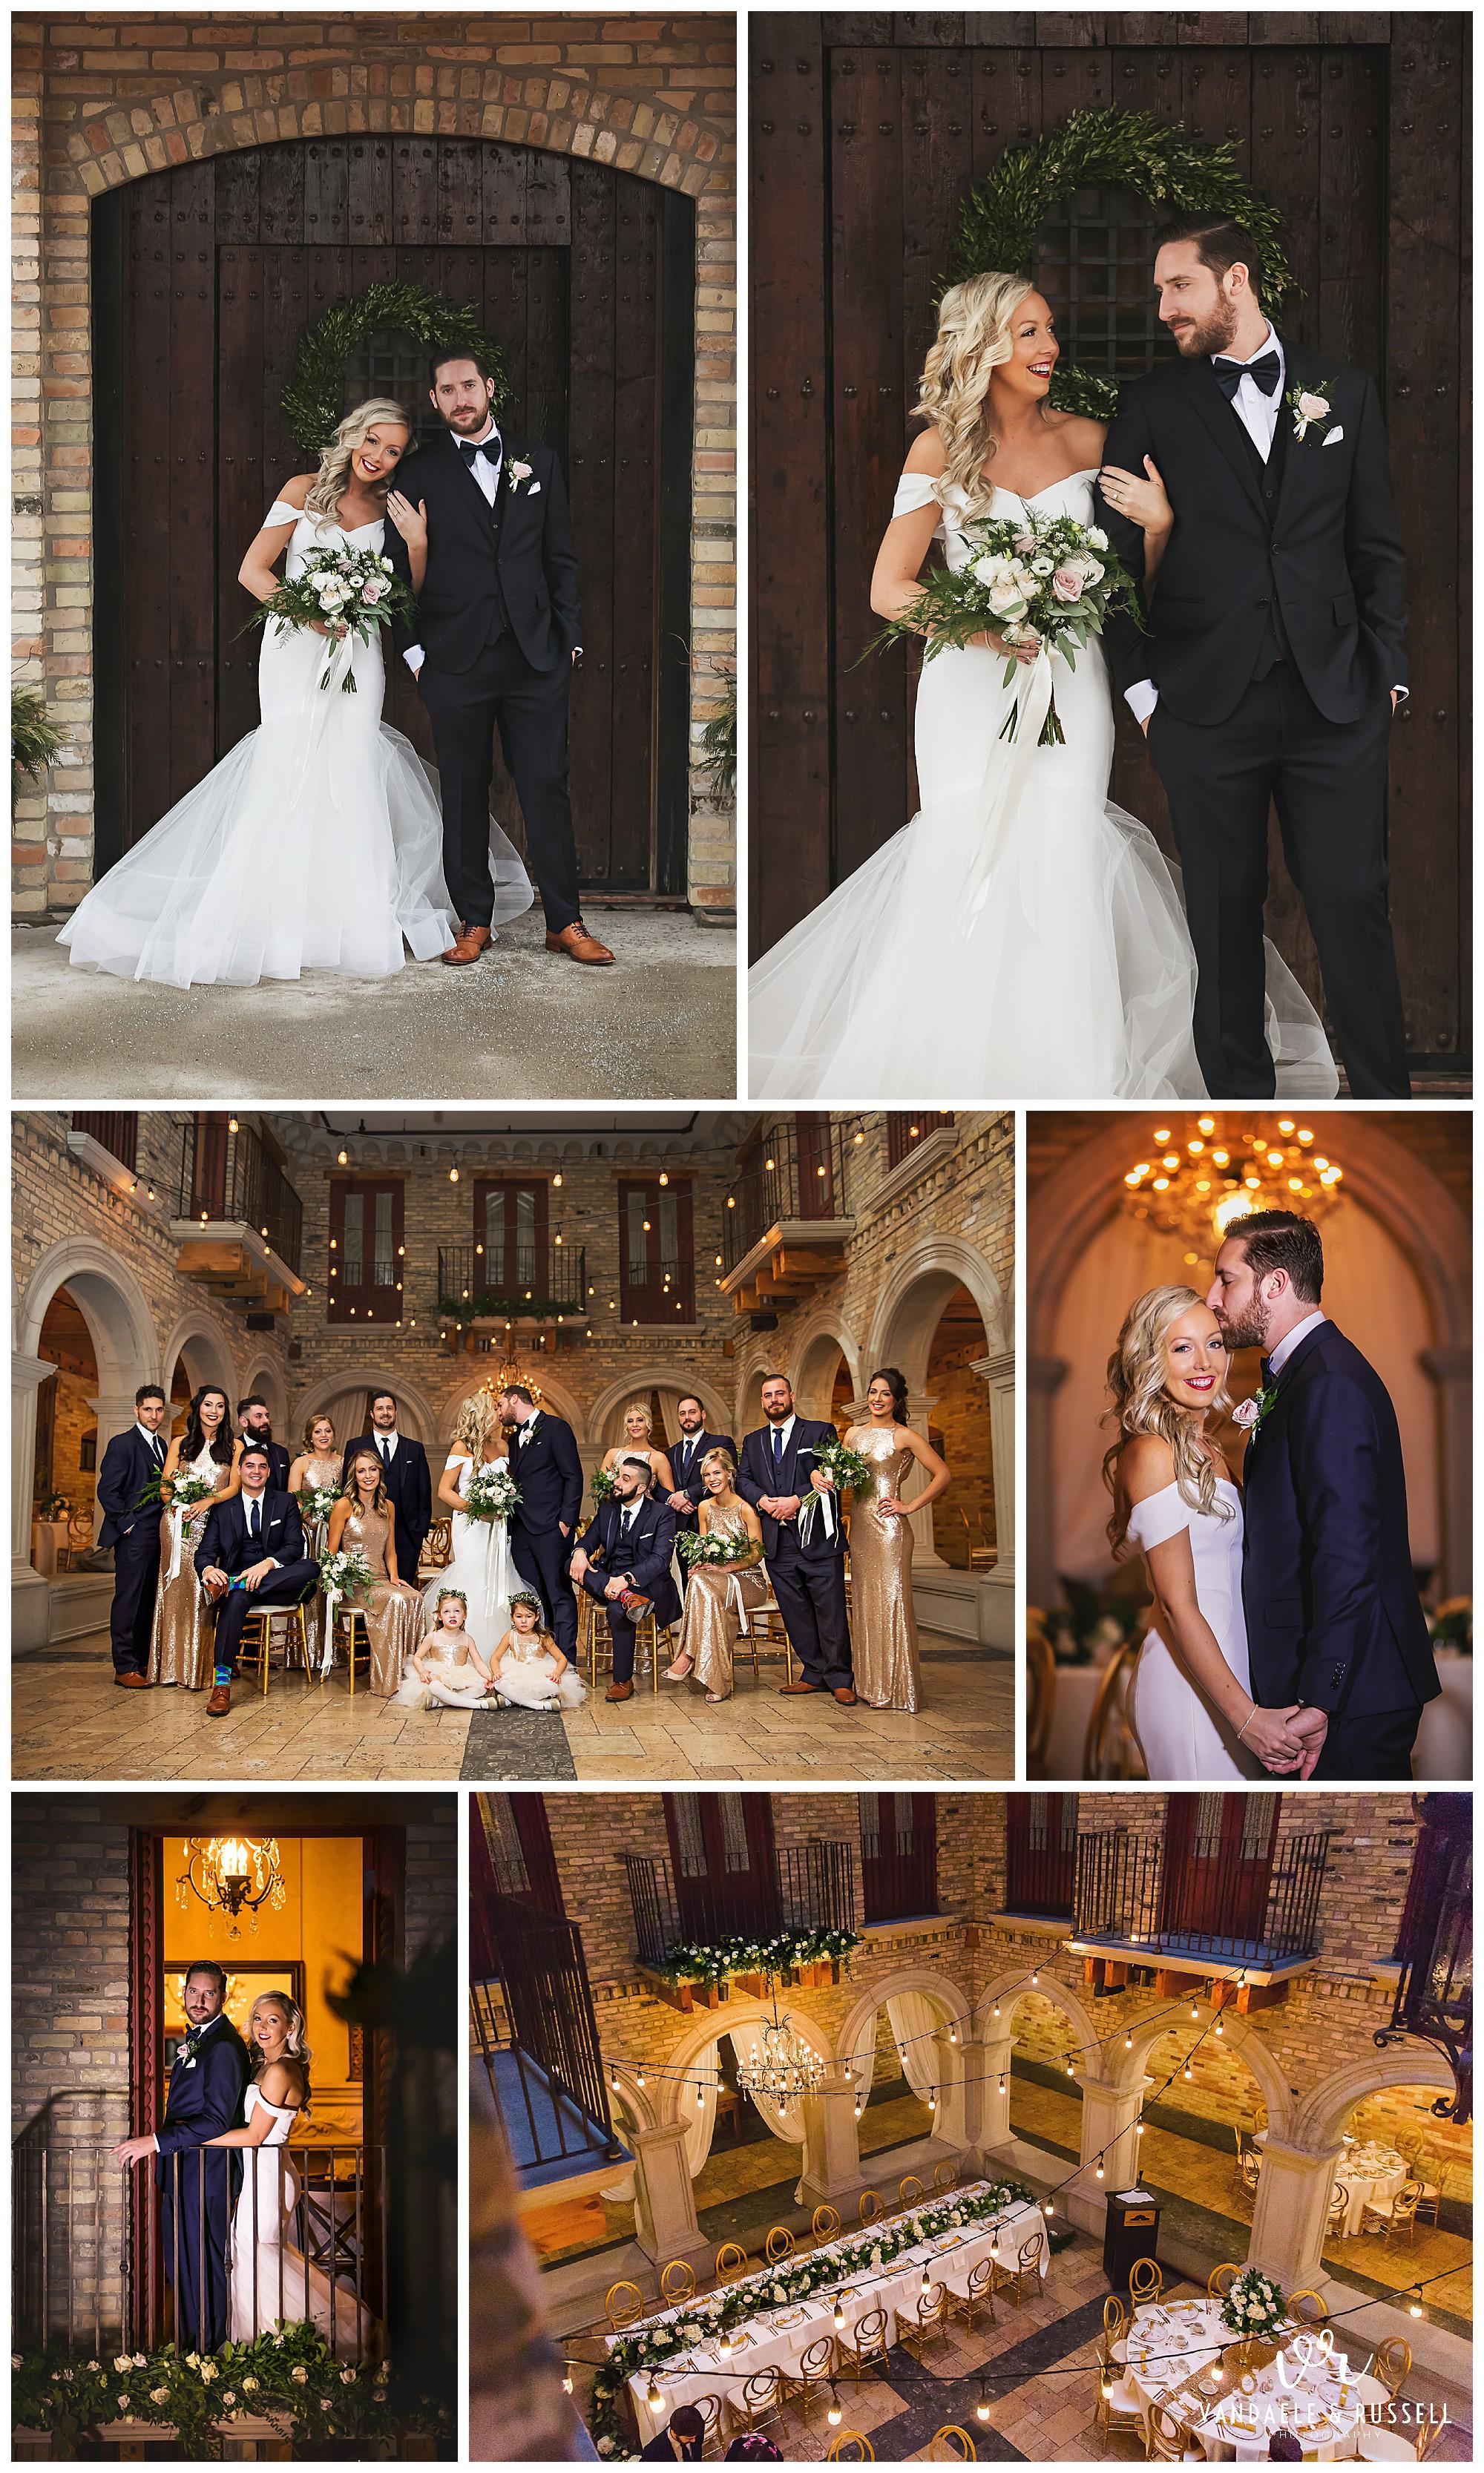 Hacienda-Sarria-Wedding-Photos-NYE-Michelle-Matt-VanDaele-Russell_0020.jpg